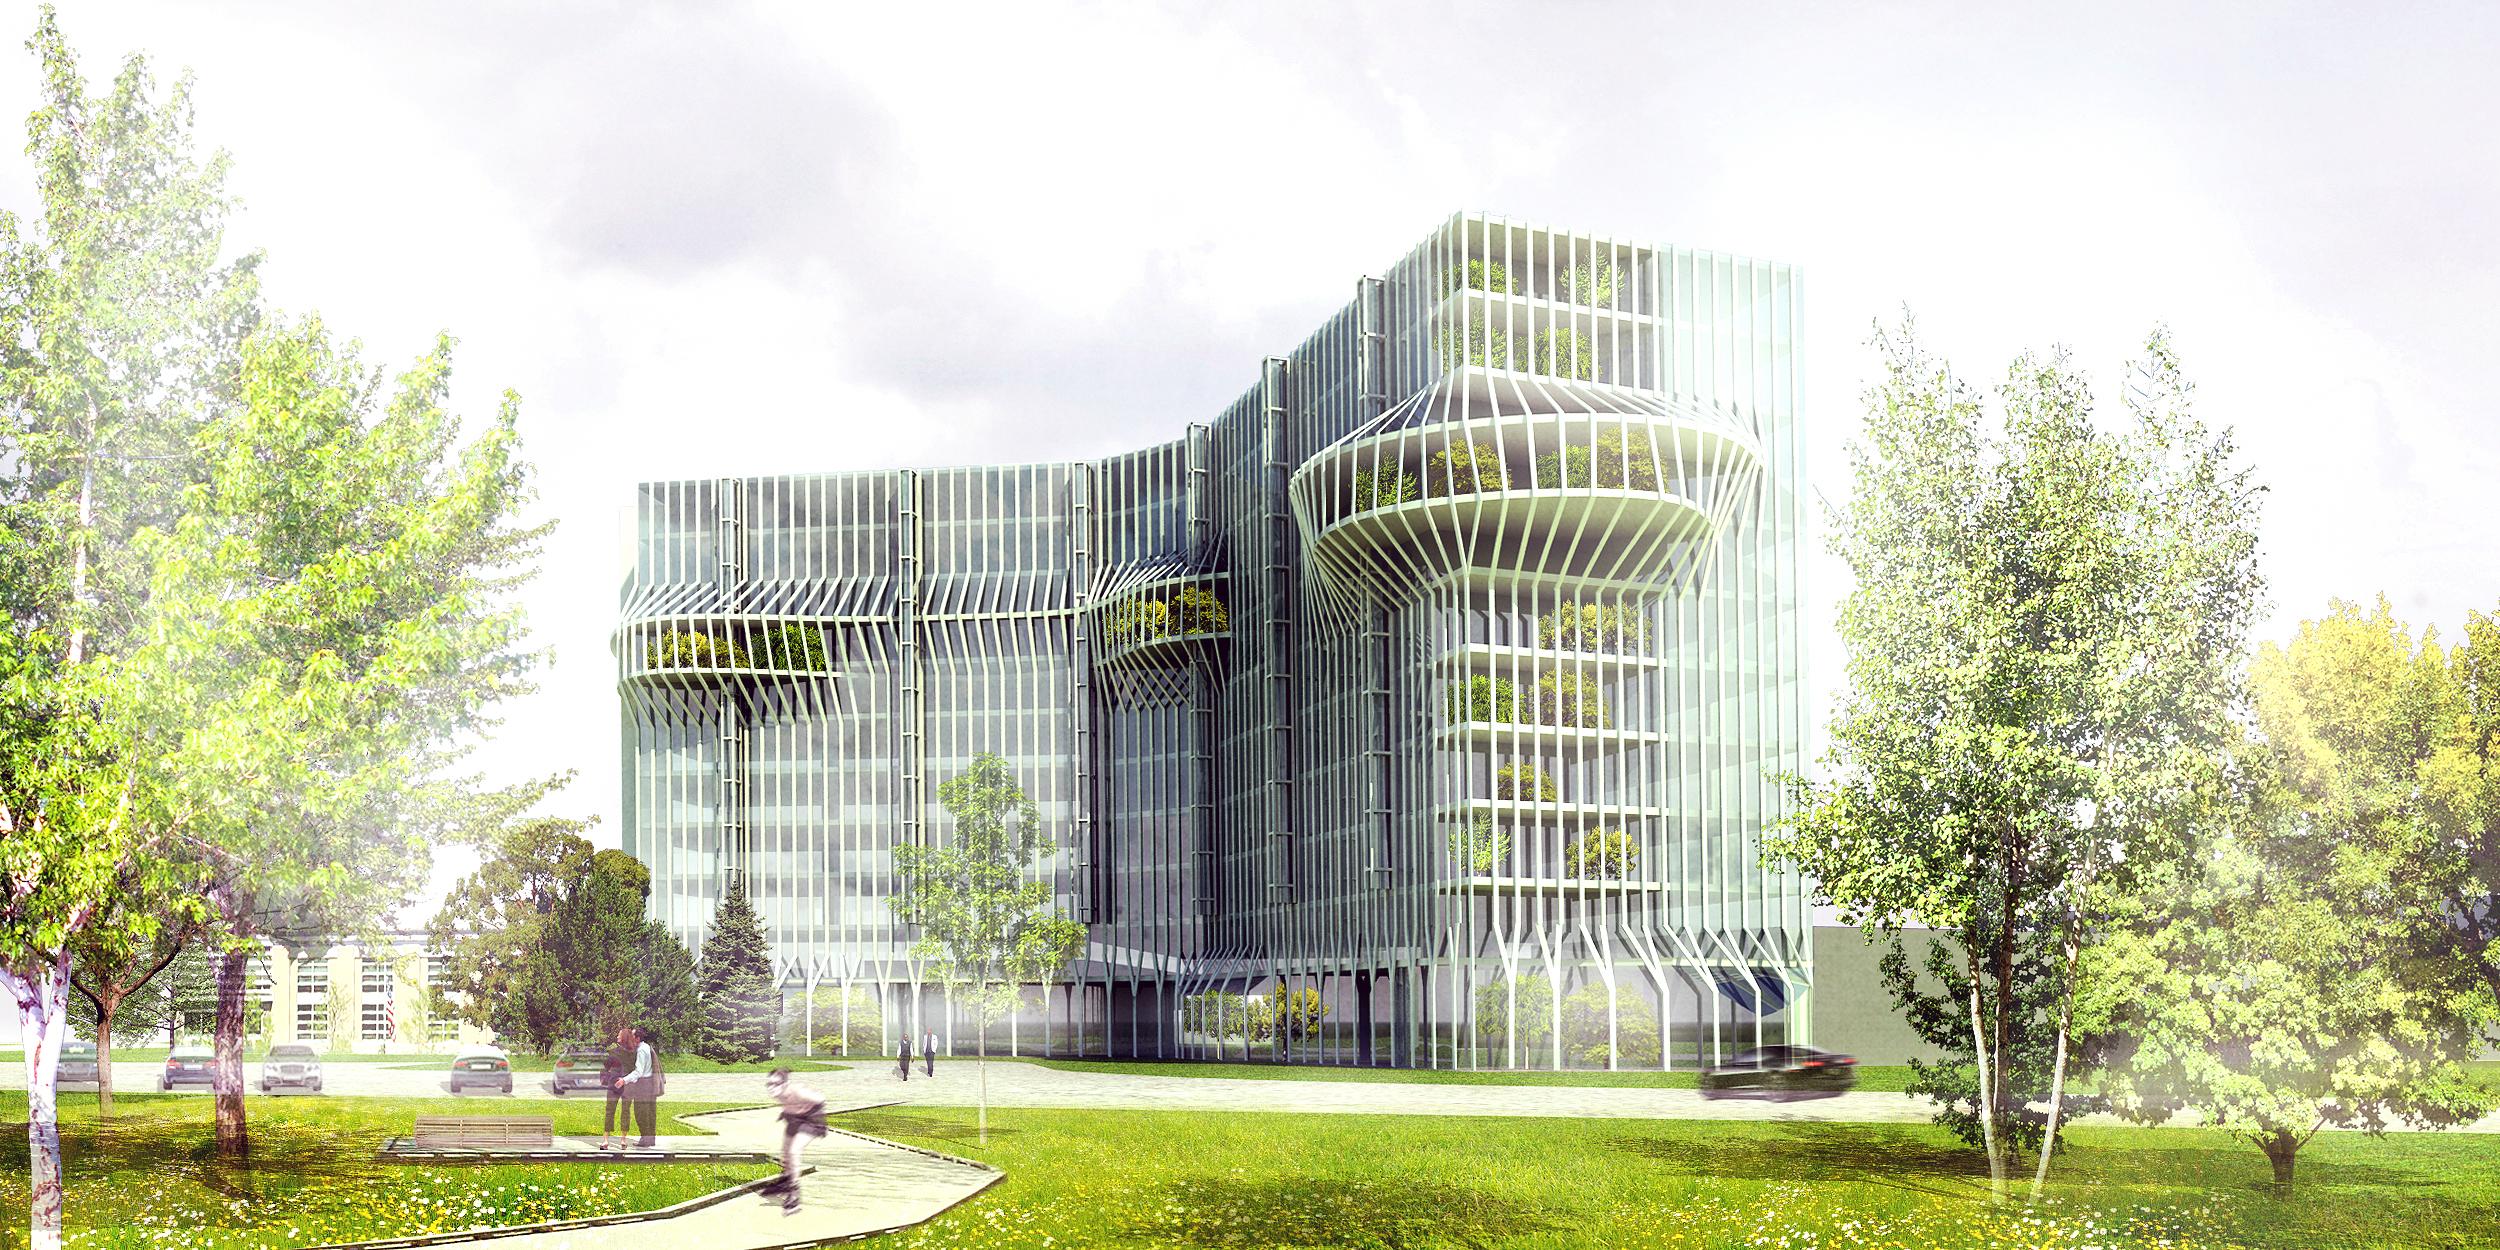 community-hospital-rendering-exterior.jpg